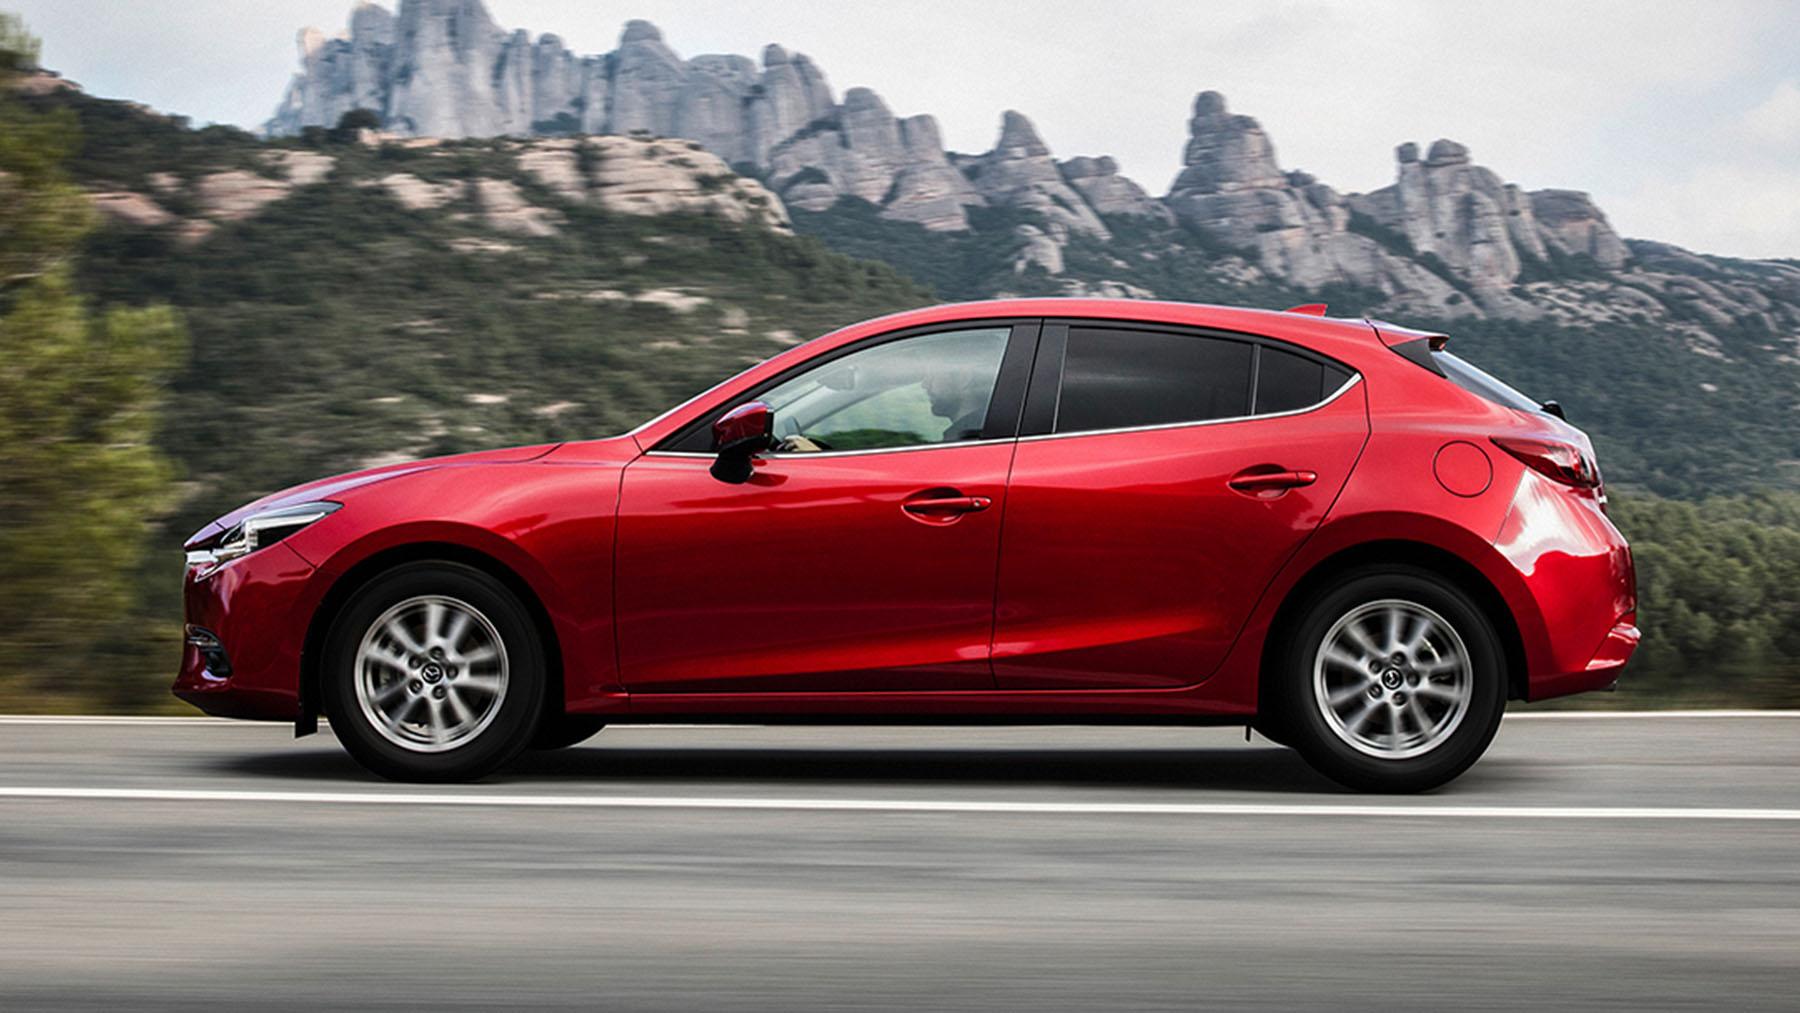 Mazda 3 Hatchback >> Mazda 3 2018 hatchback en México color rojo lateral izquierdo - Autos Actual México